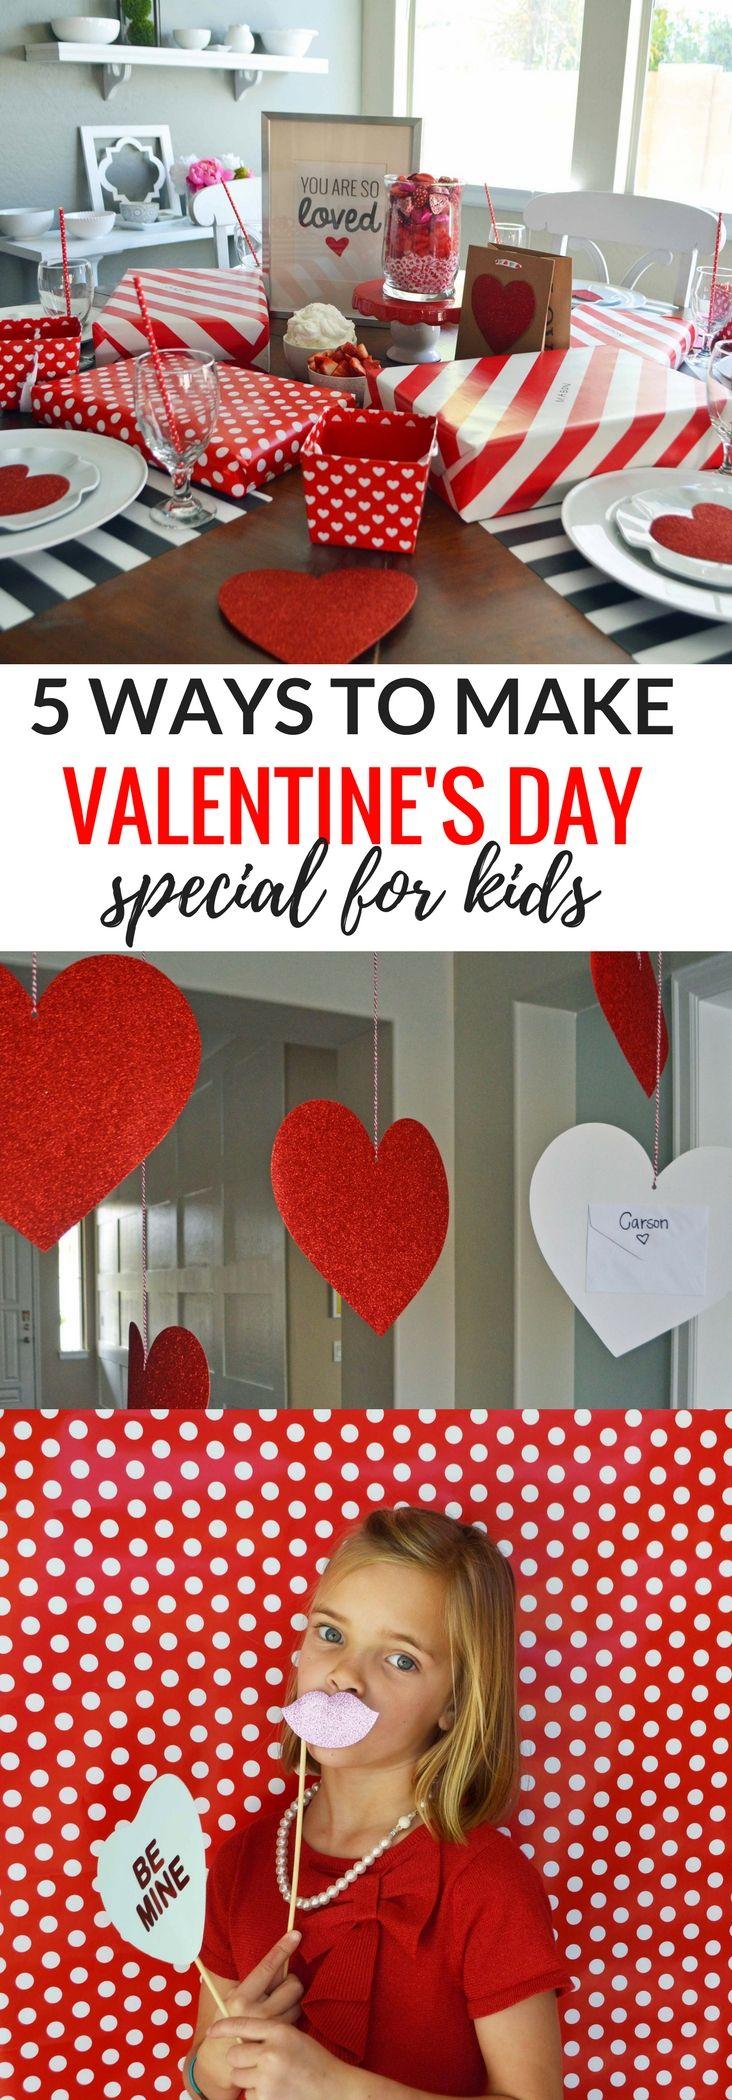 c45ea0a24599d235fec2ea5da69bec14 valentine day special valentines day photos - Five 5 Ways to Make Valentine's Day special for kids. Ideas on how to make Valen...